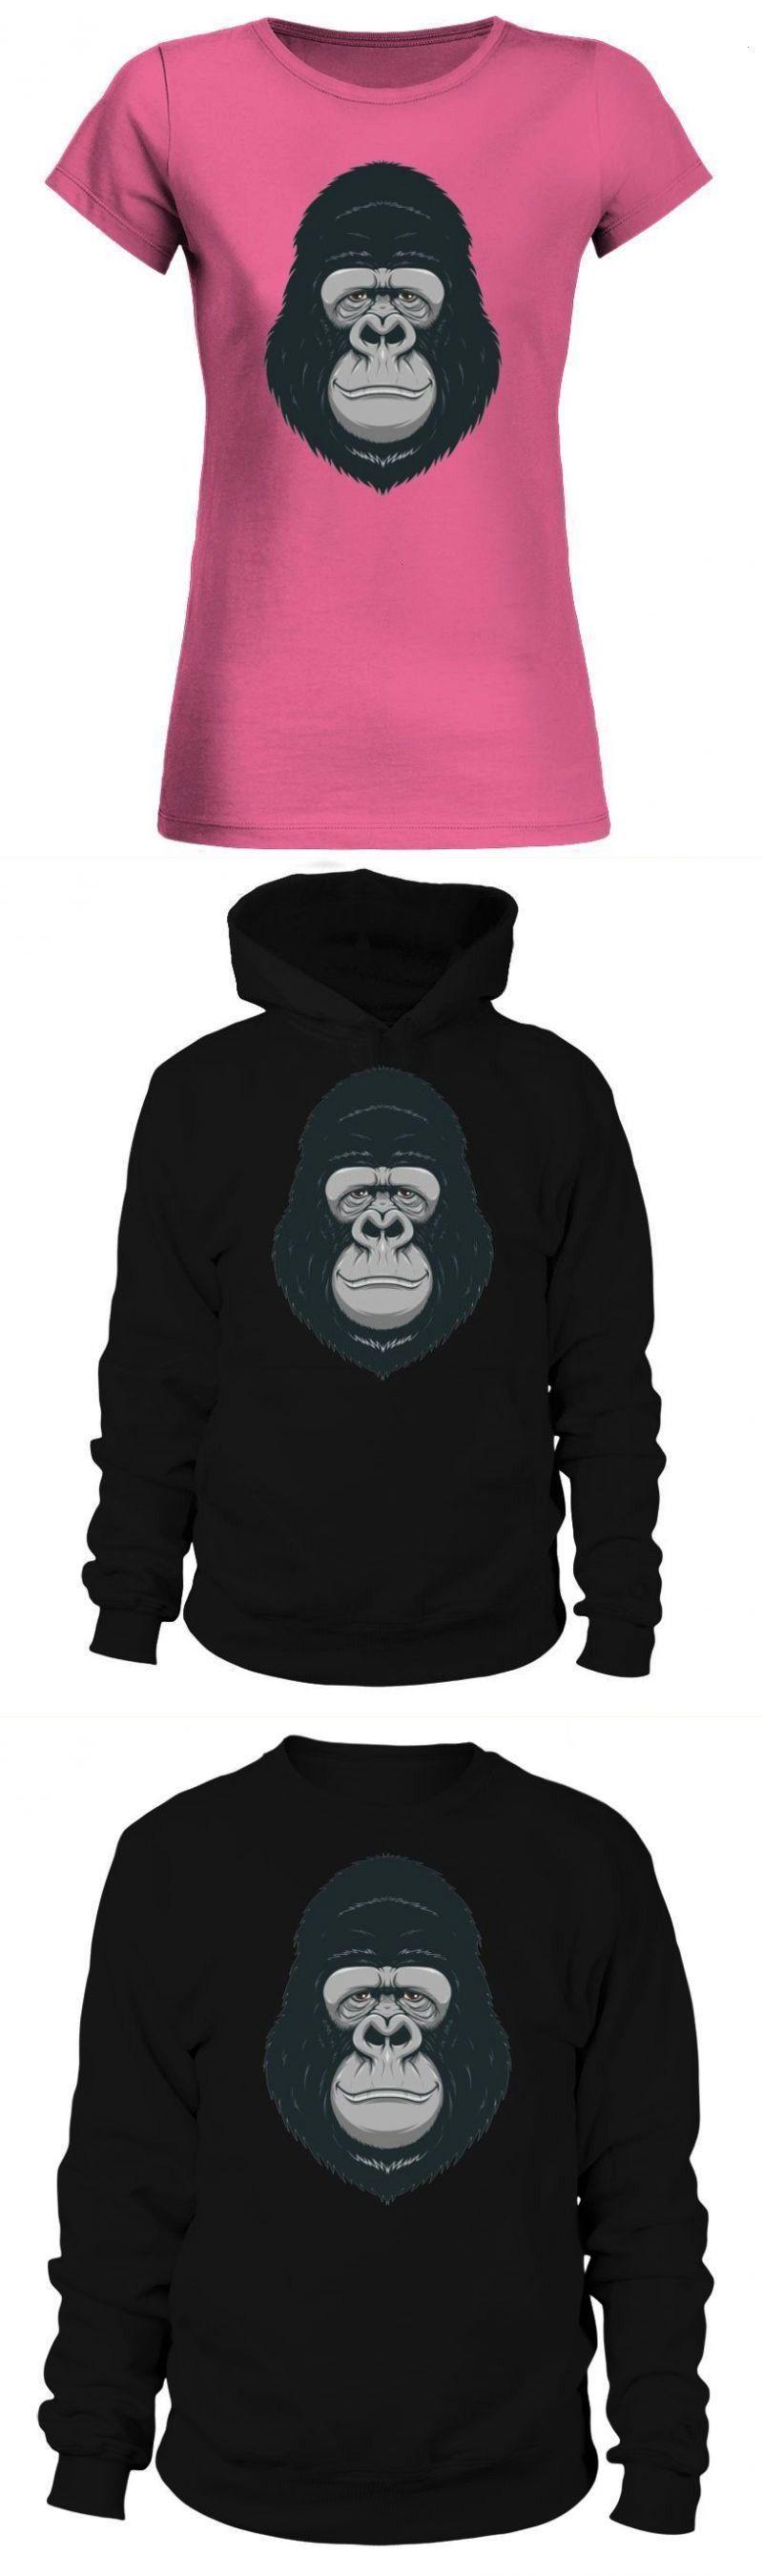 monkey garage long sleeve t shirt happy monkey 2 talladega nights mens spider monkey graphic tshirt Gas monkey garage long sleeve t shirt happy monkey 2 talladega nights...